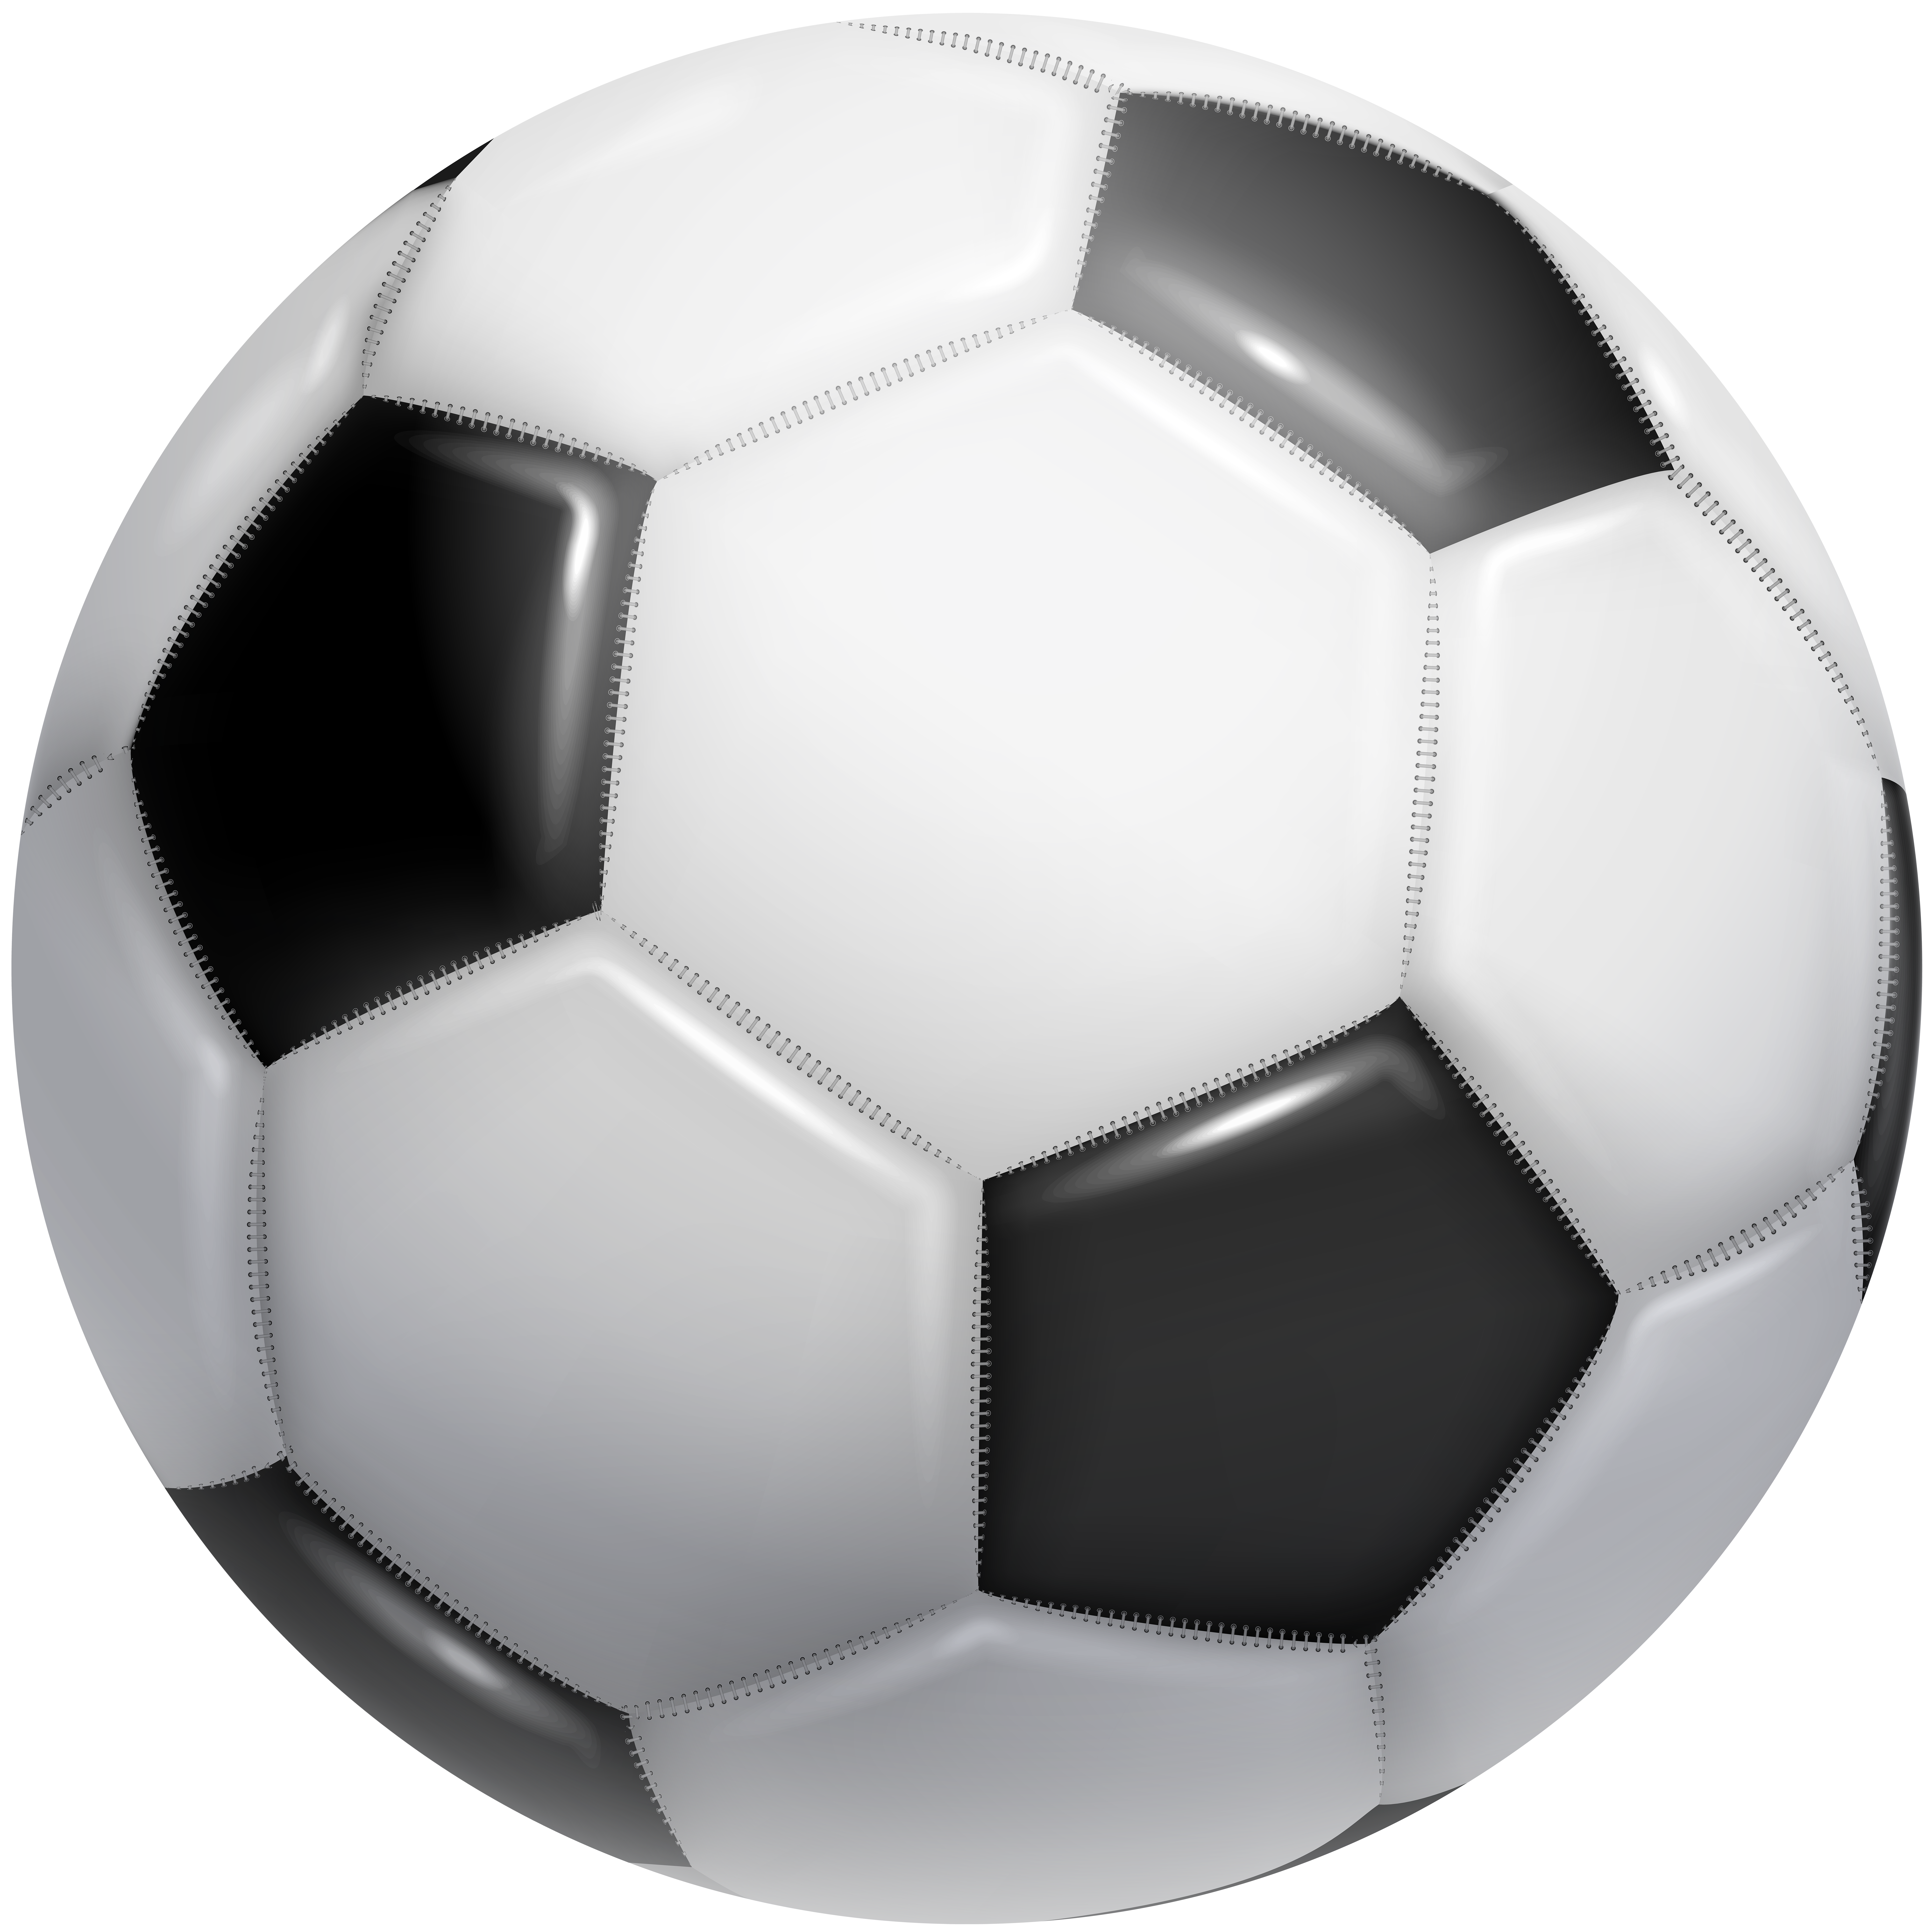 Ball clip art image. Hearts clipart soccer